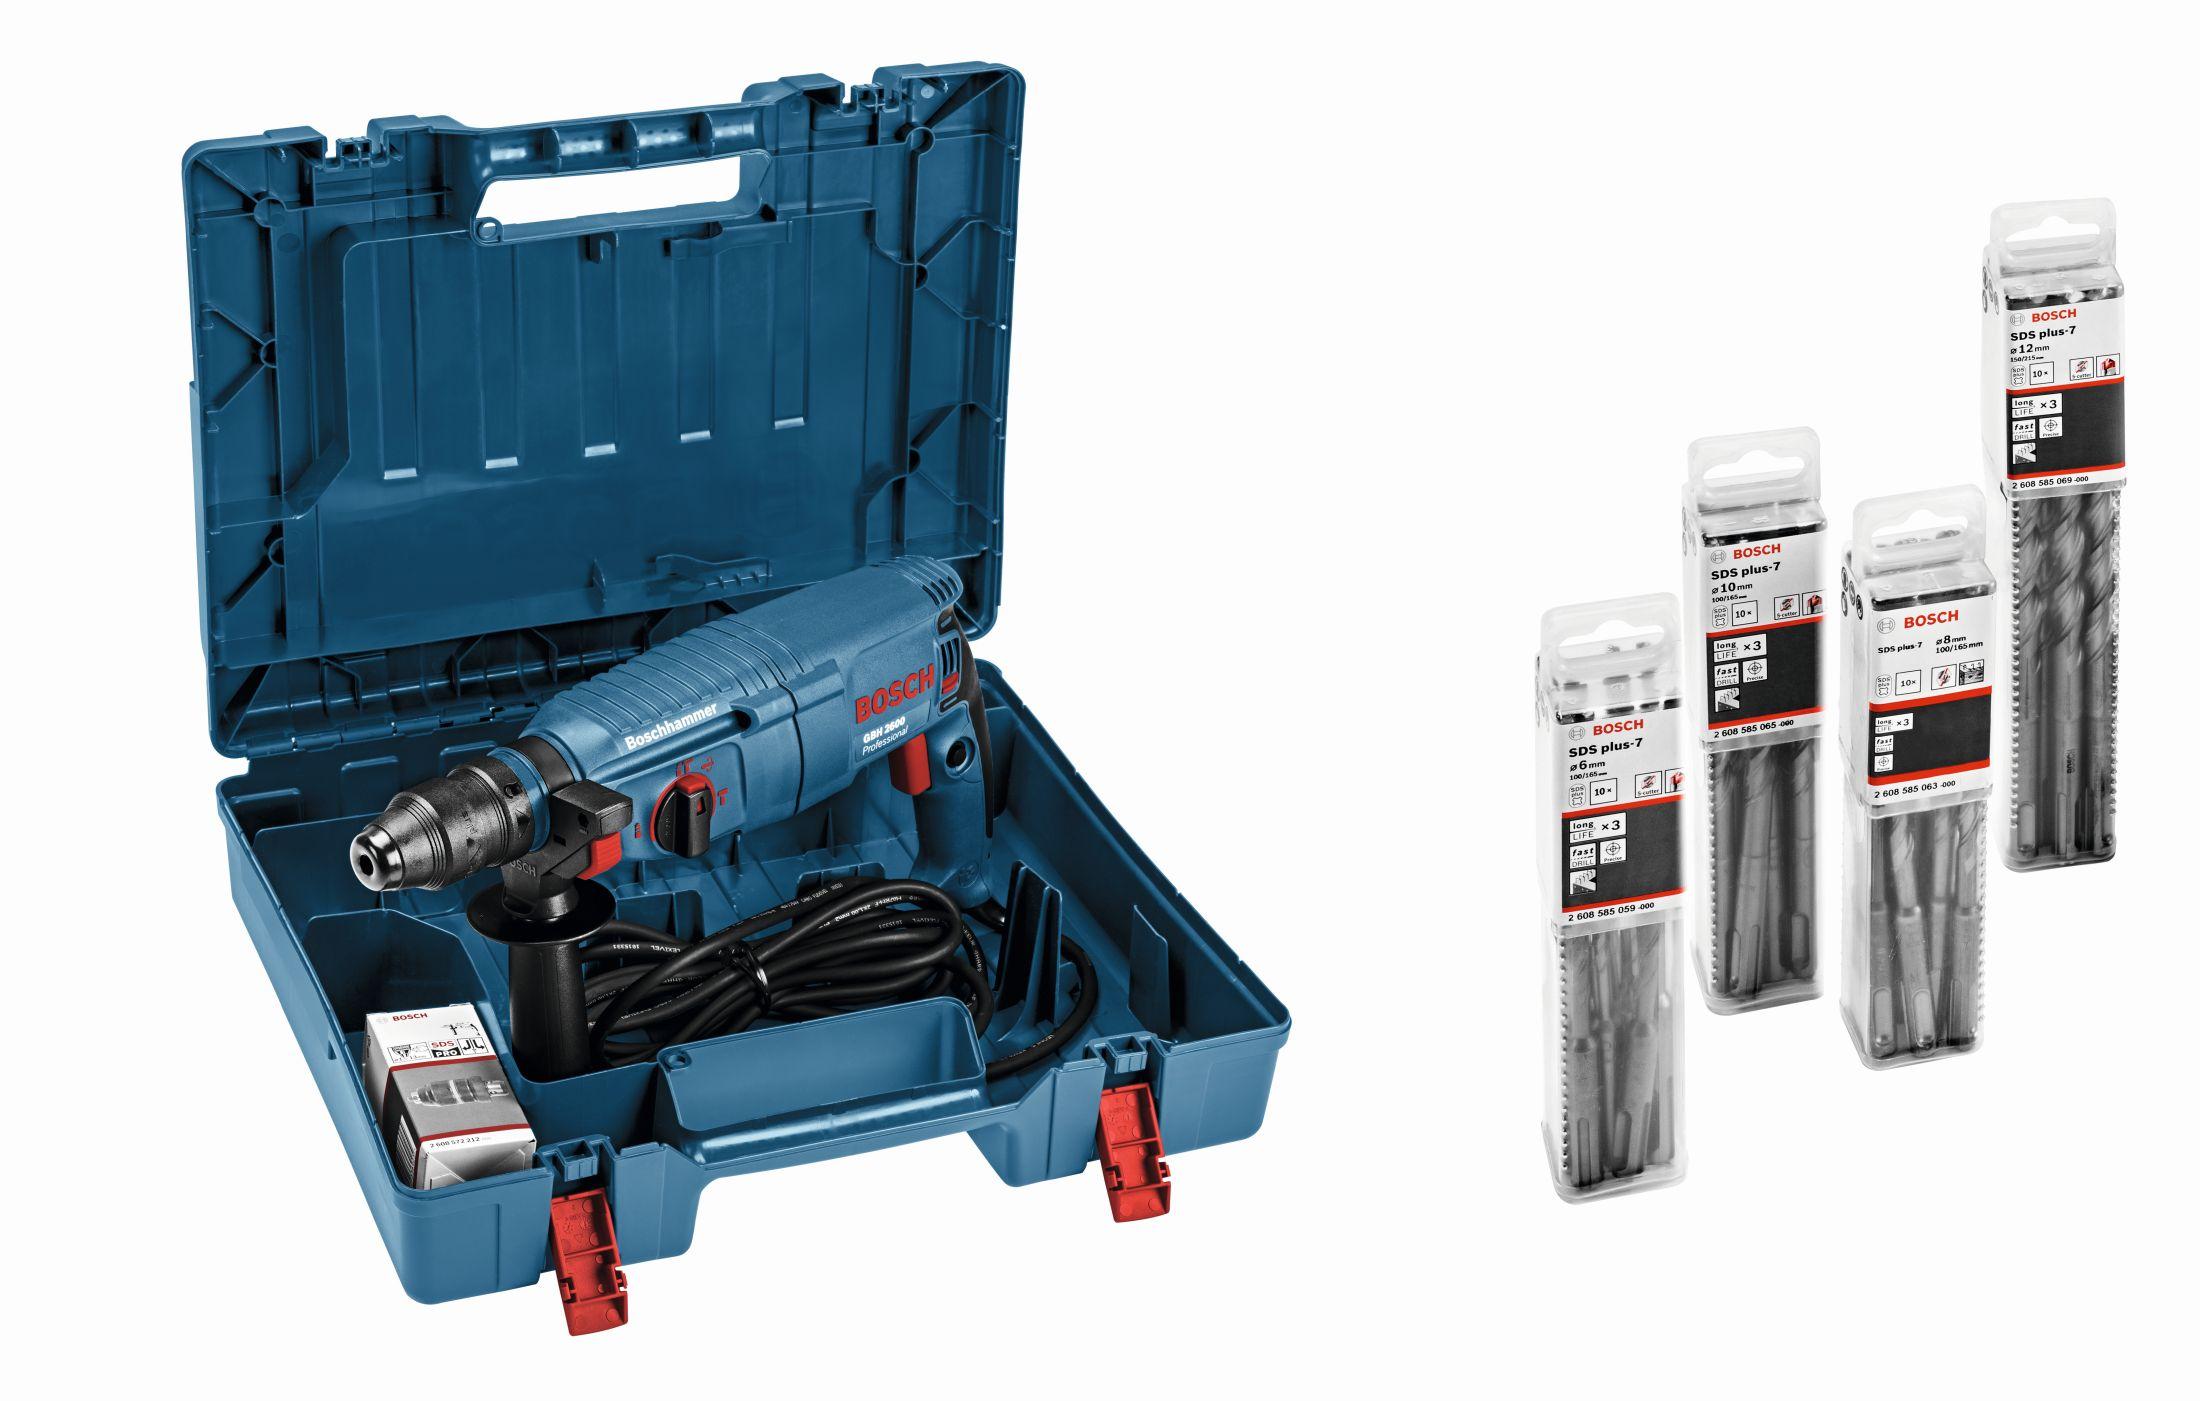 Bosch GBH 2600 Set online kaufen. FNwerkzeuge.de